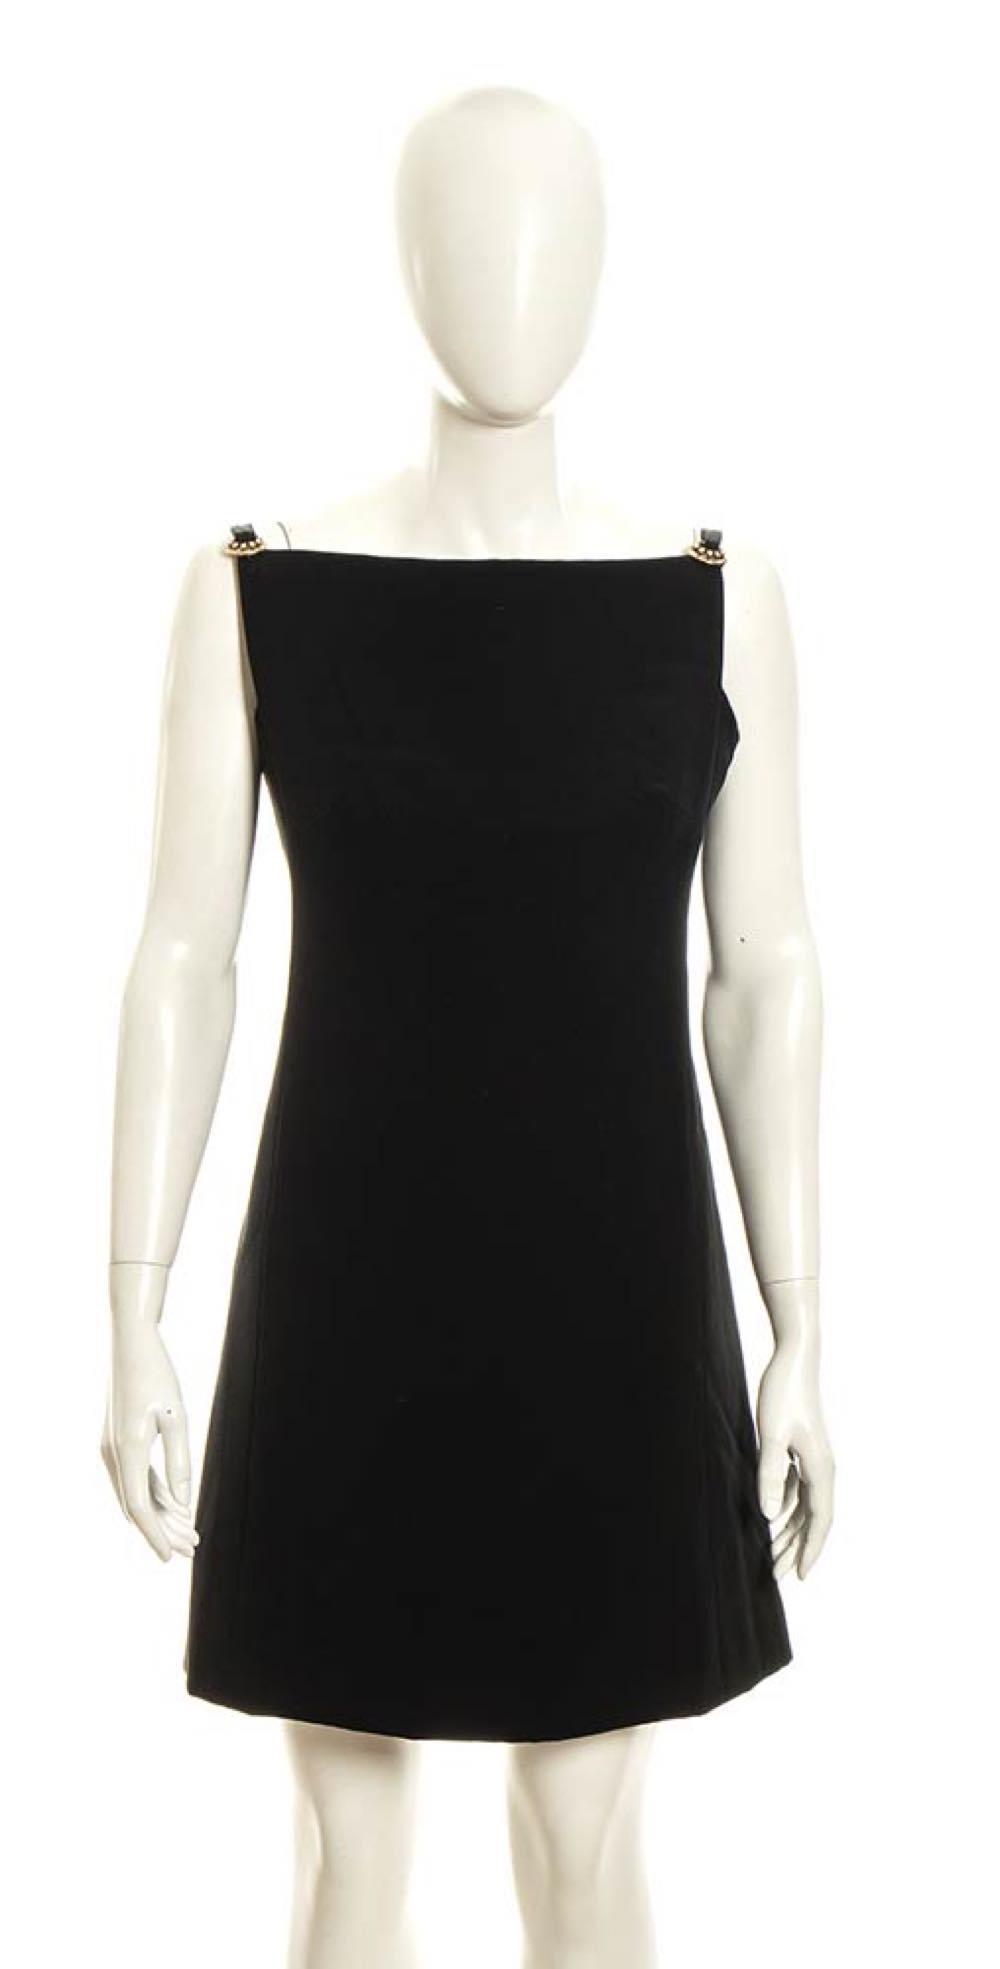 FABIANI - CREPE DRESS - Late 60s